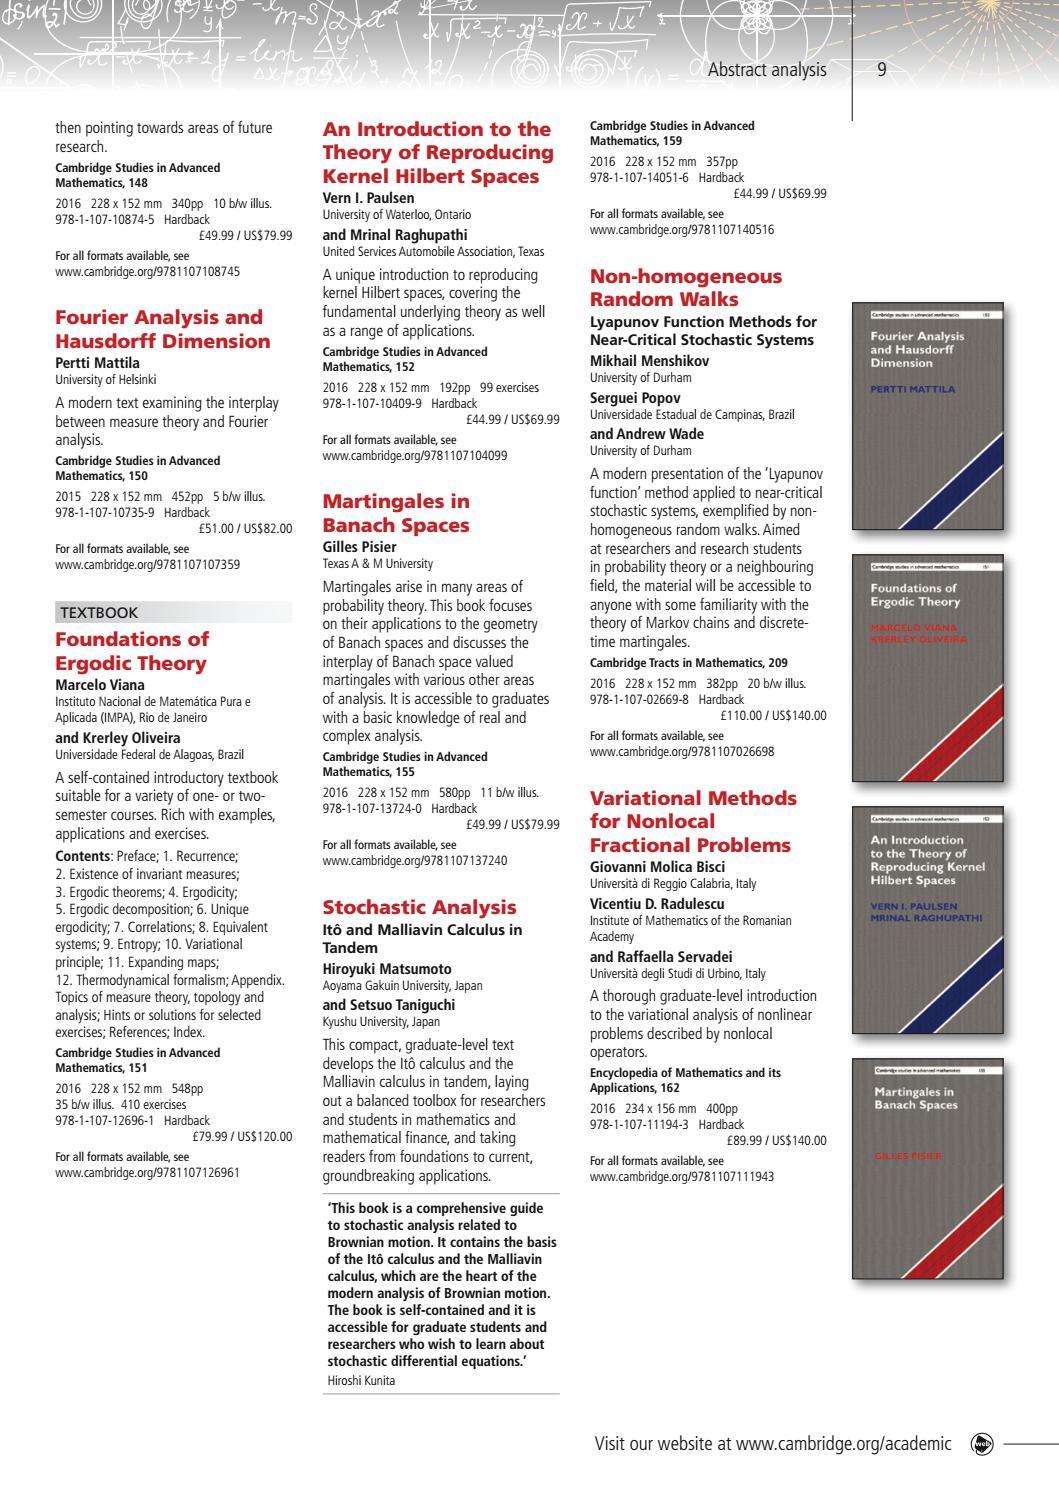 Mathematics Catalogue 2017 By Cambridge University Press